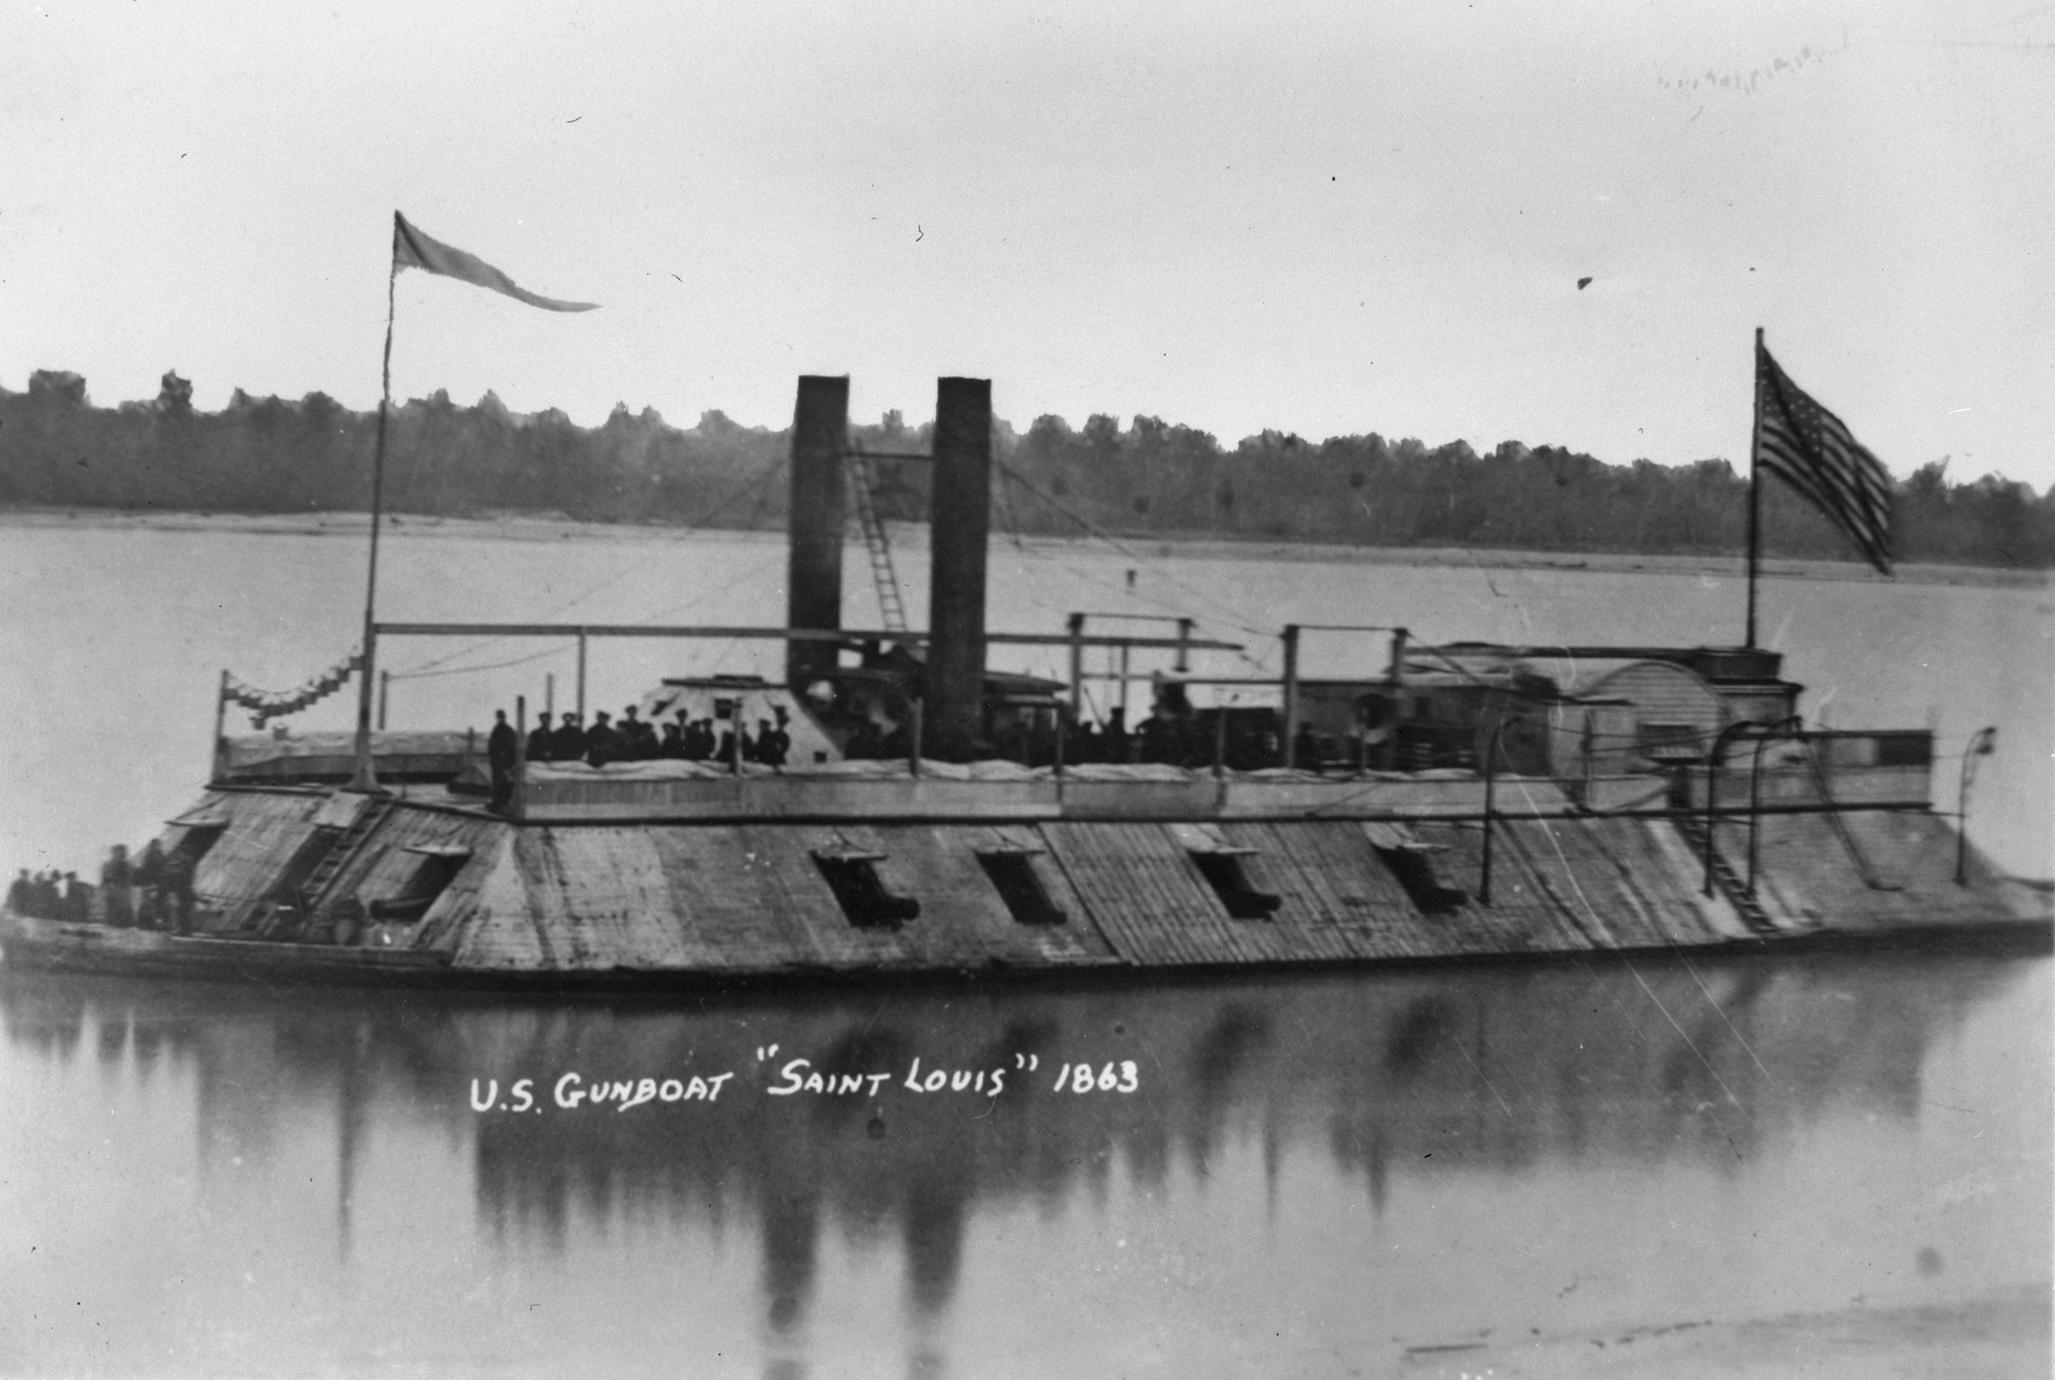 St. Louis (Gunboat, 1861-1863)